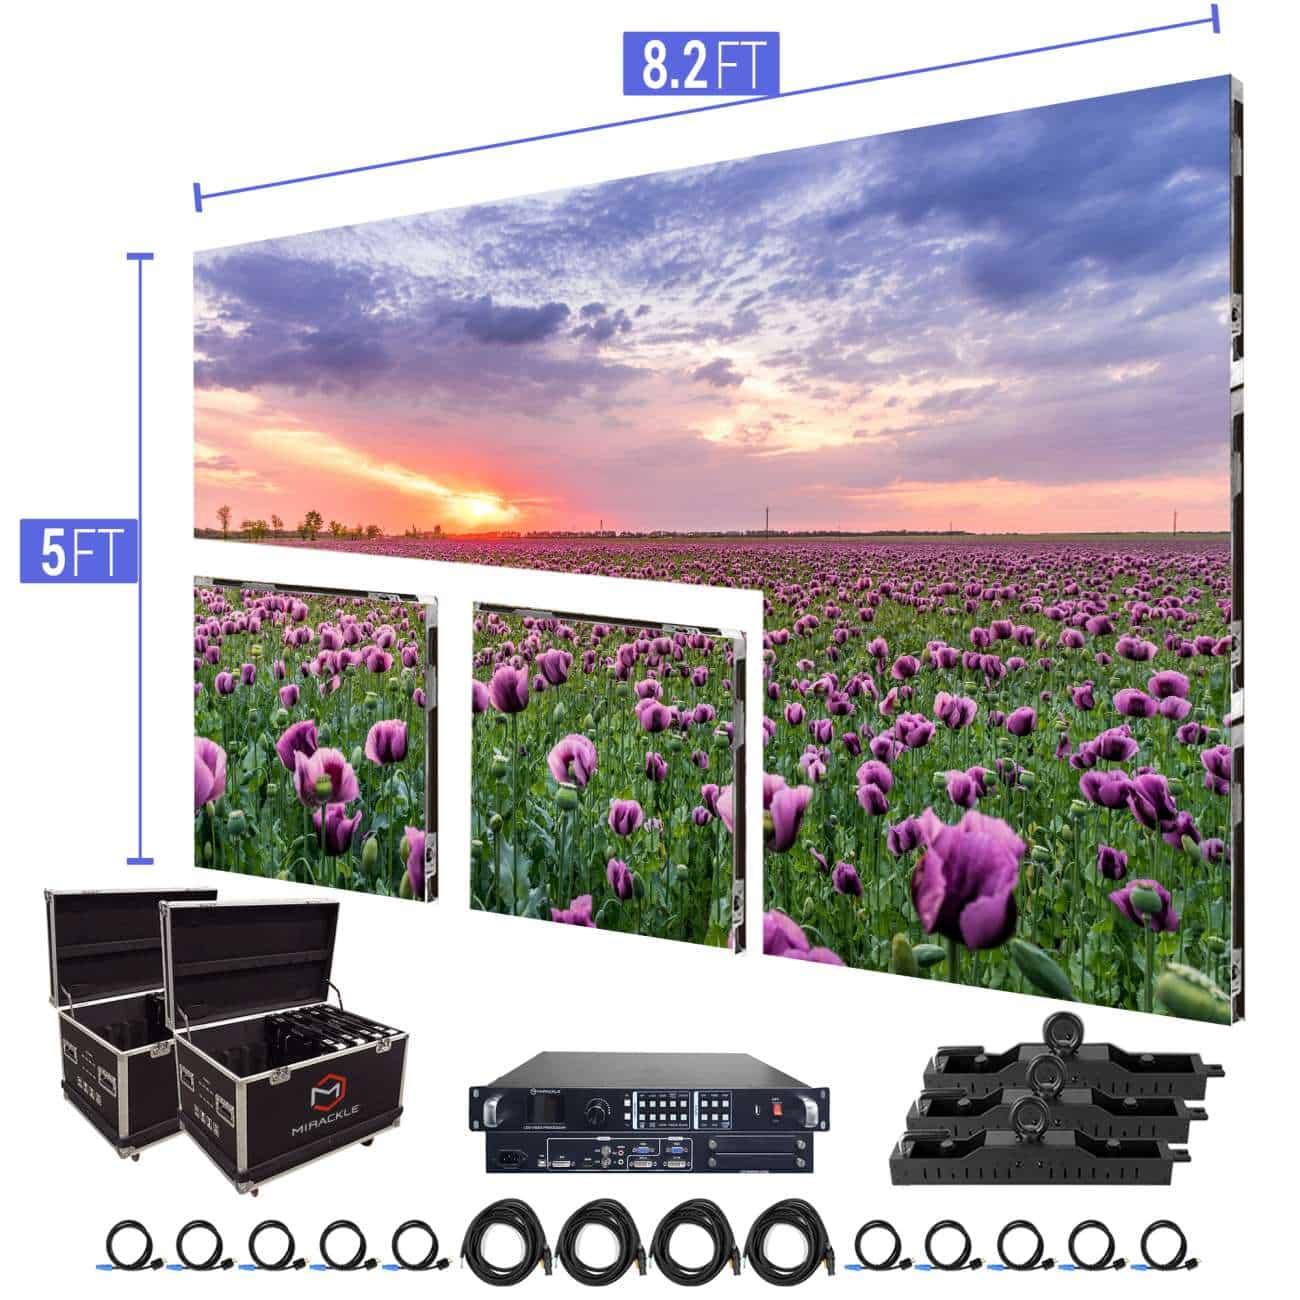 LED-Video-Wall-P3.91-8.2x5